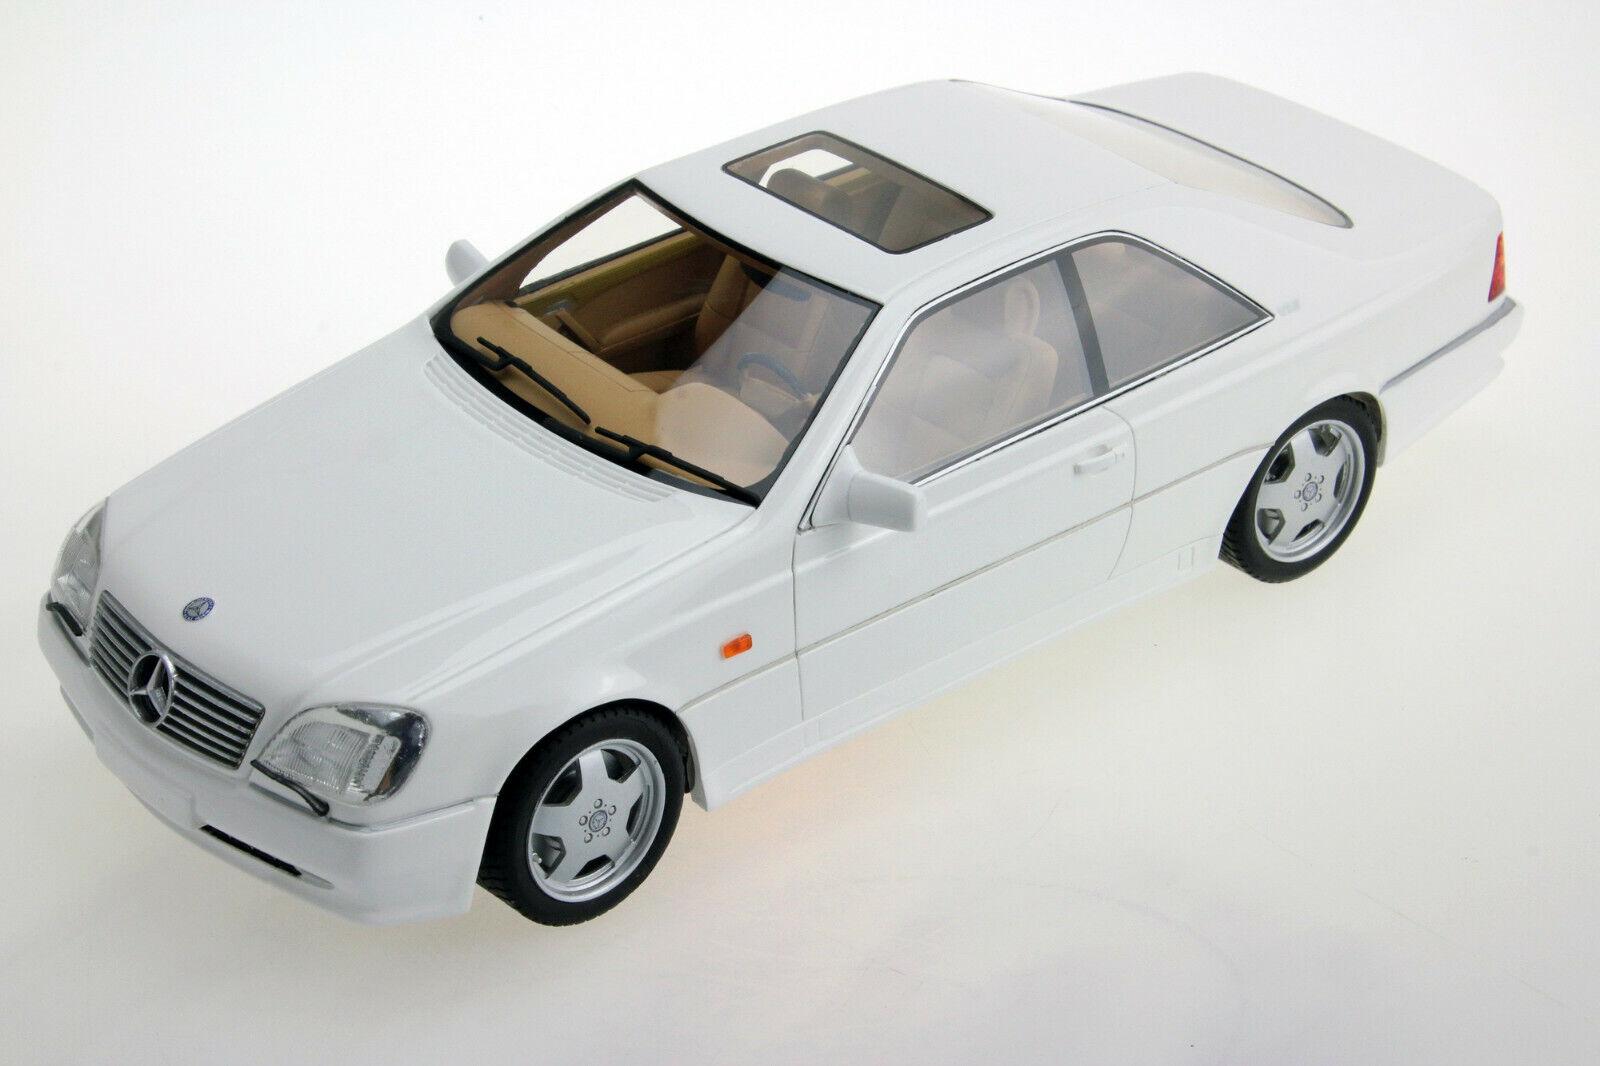 MERCEDES CL 600 AMG 7.0 COUPE 1998 C140 POLAR WHITE LS COLLECTIBLES LS036C 1 18